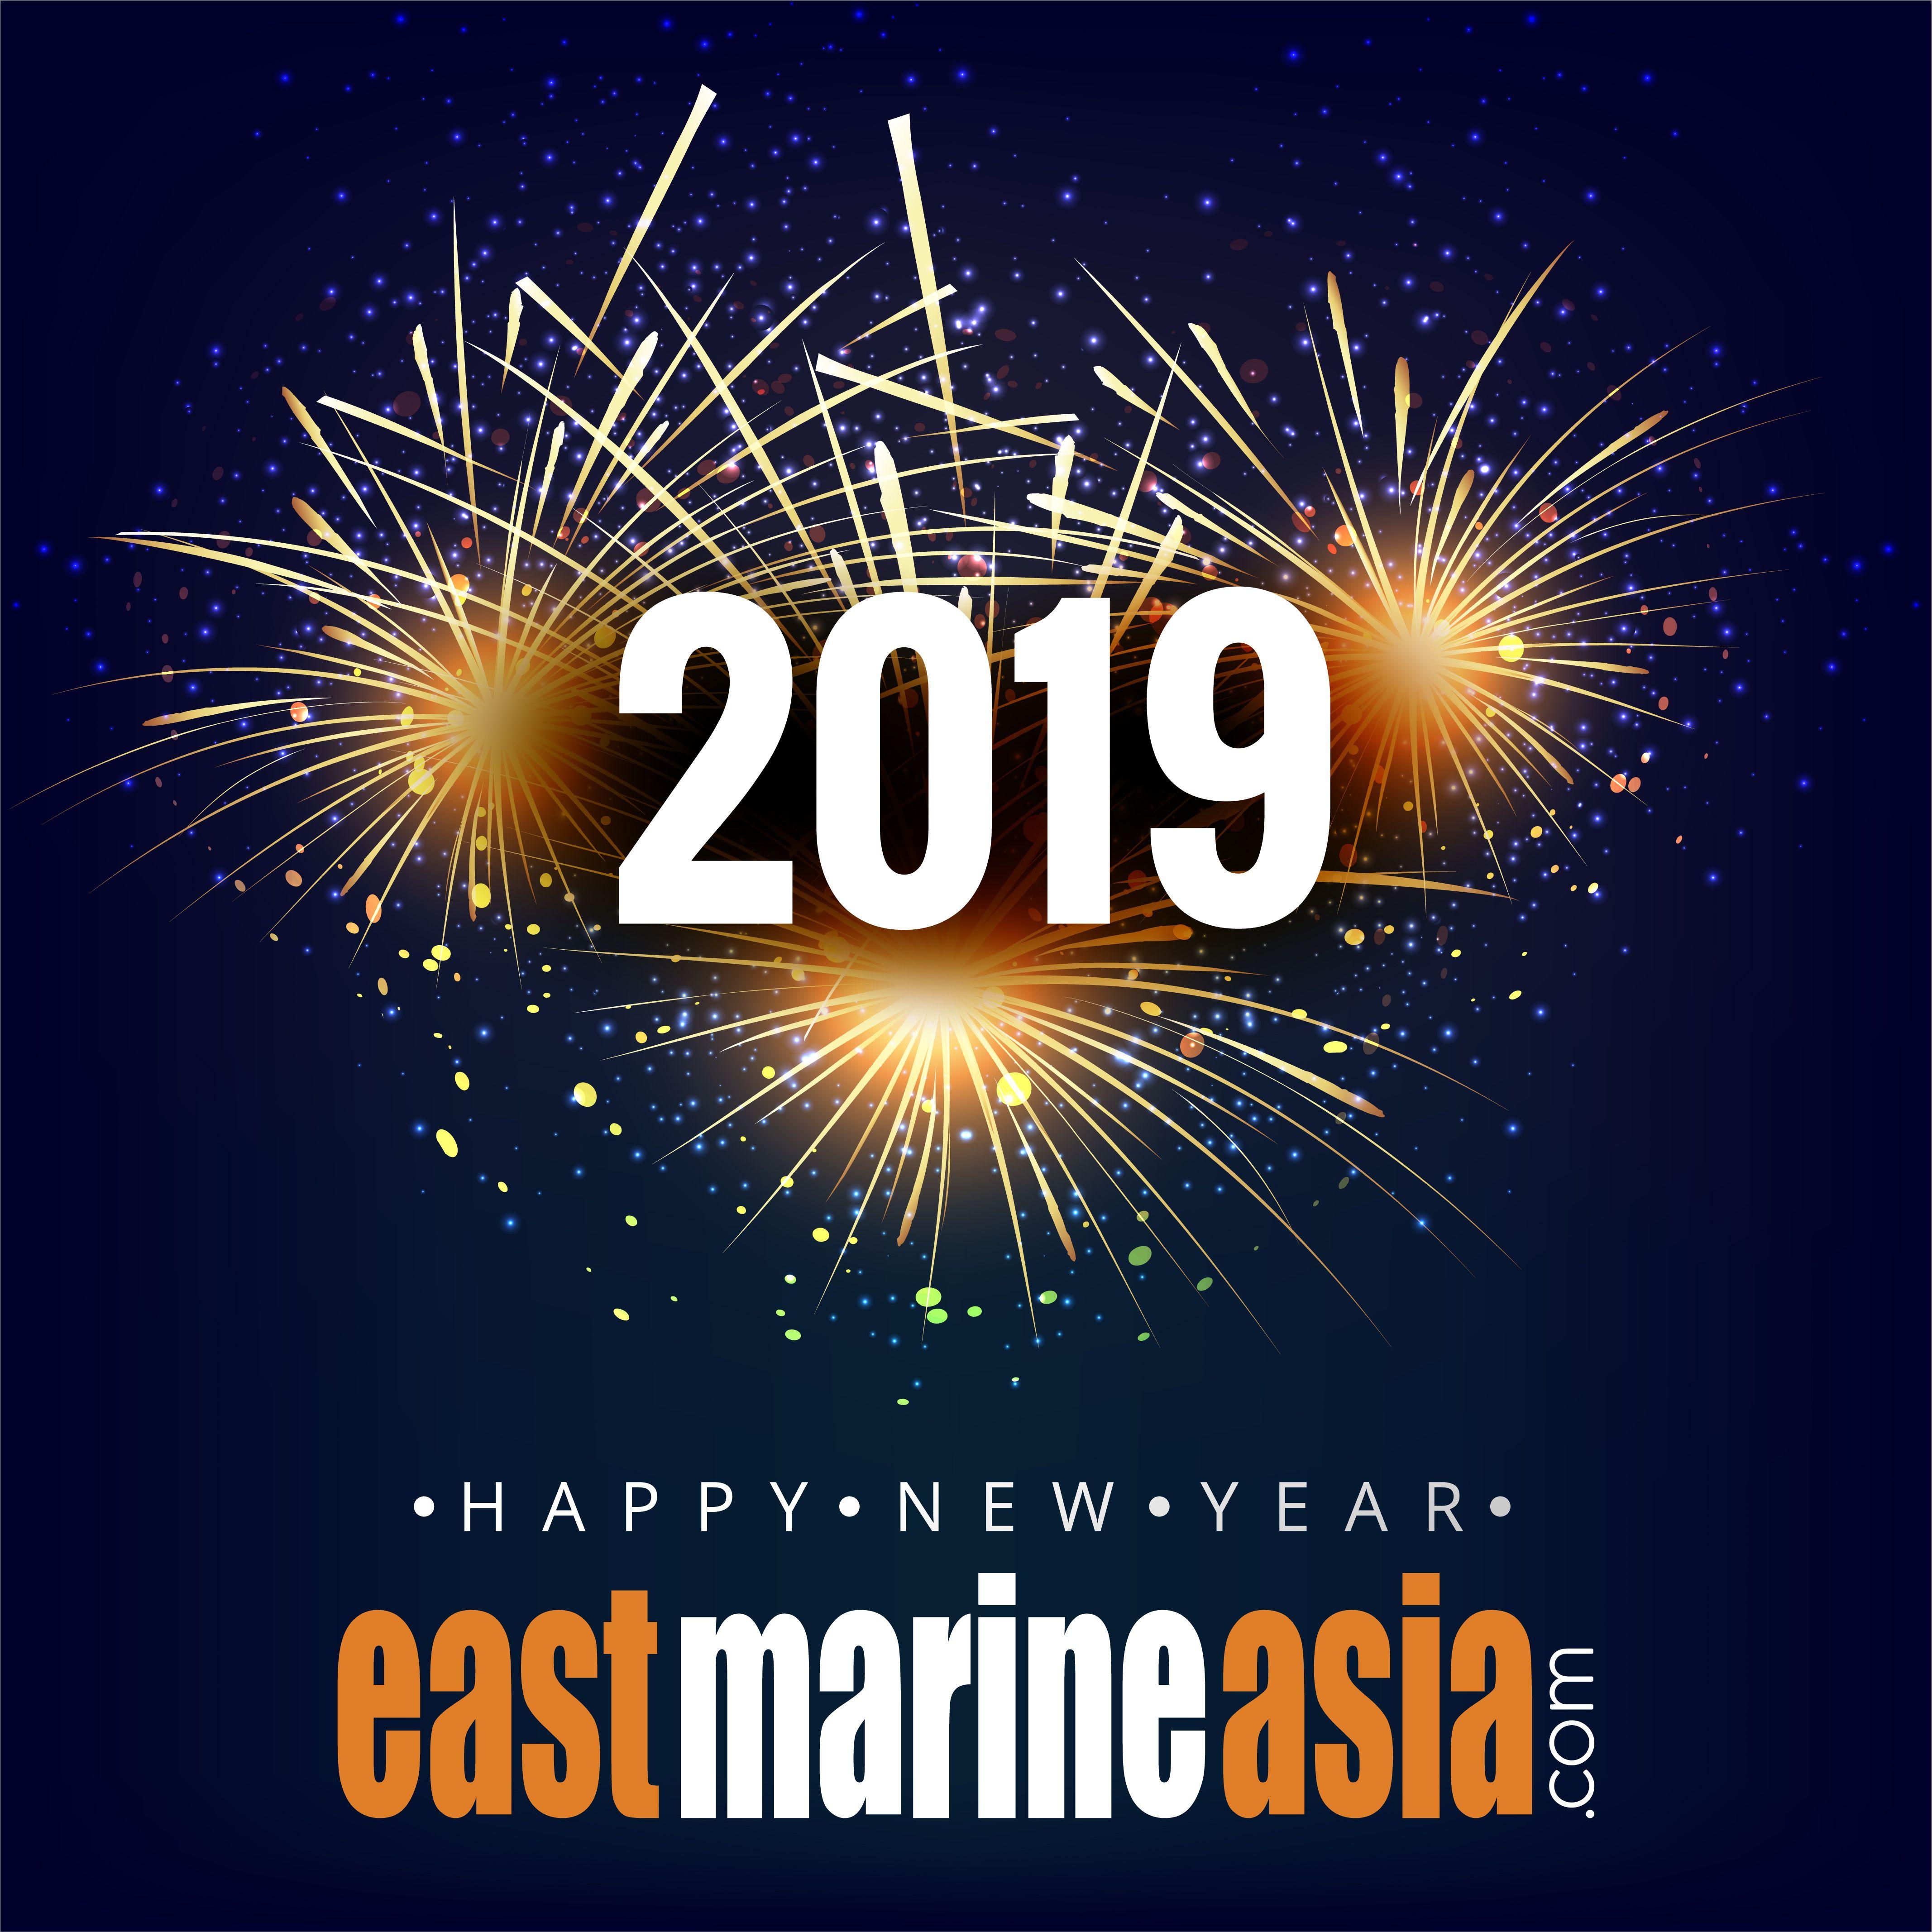 Happy New Year 2019 By Eastmarineasia Phuket Thailand